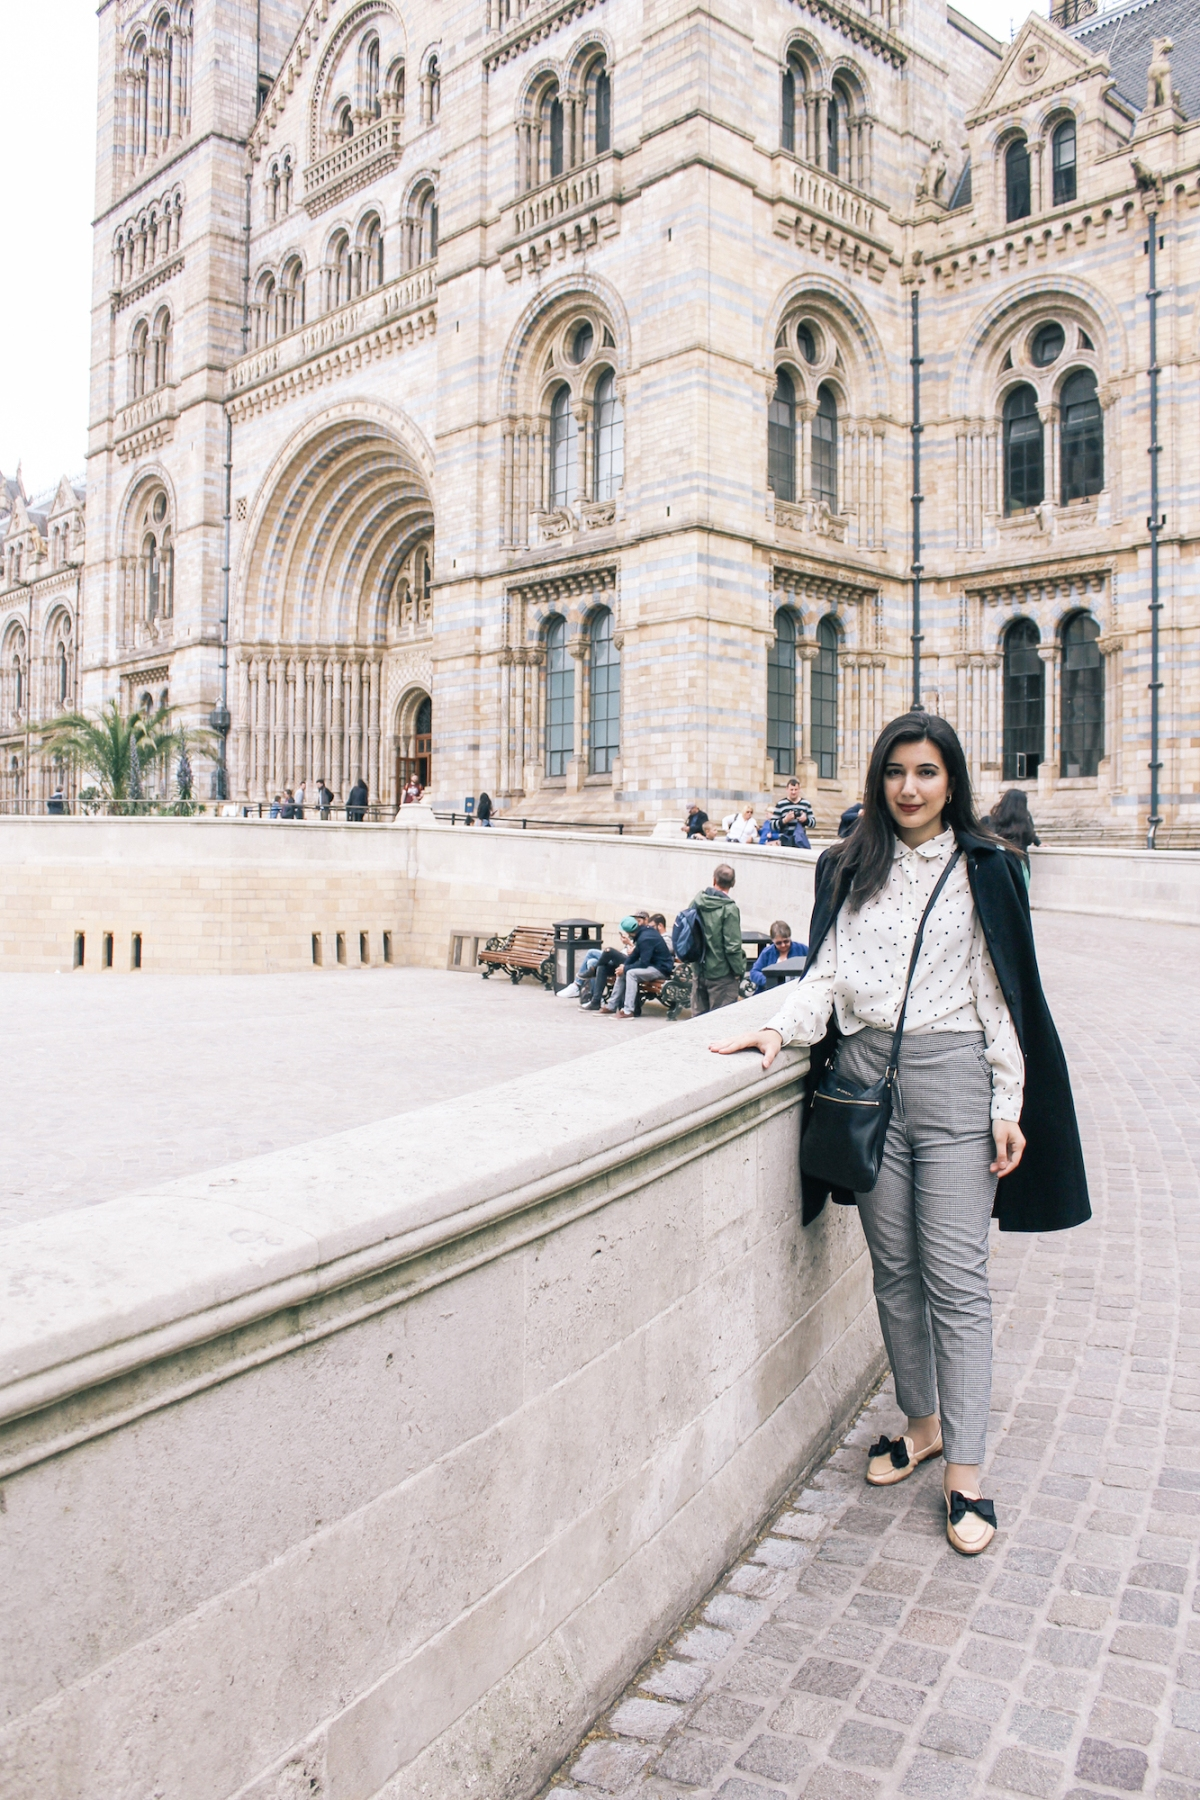 South Kensington, London, United Kingdom, London fashion, lookbook, fashion blogger, gingham pants, collared top, chic, Kate Spade, Zara